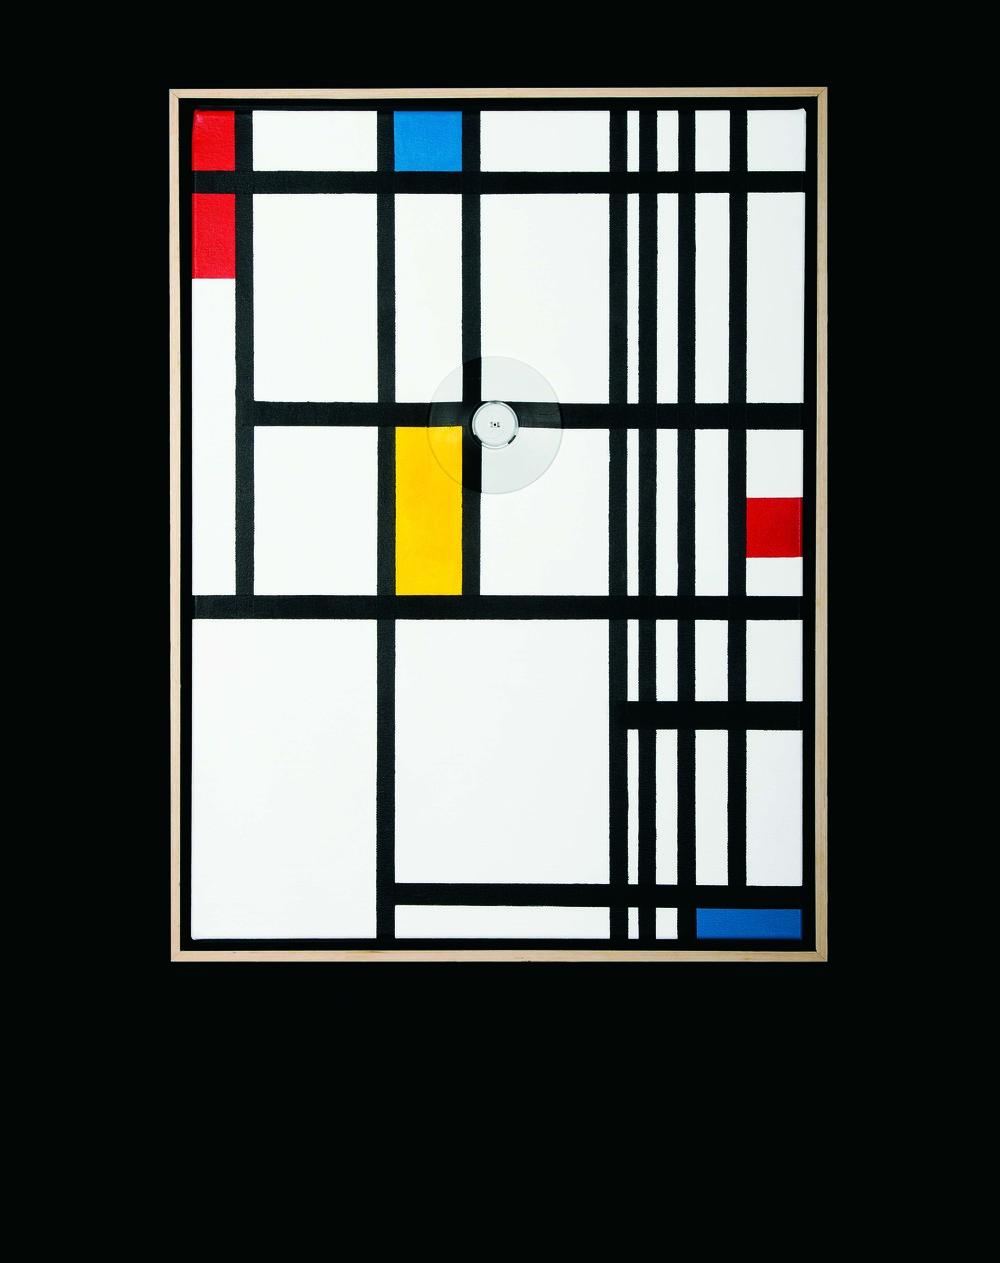 Mondrian_7.jpg